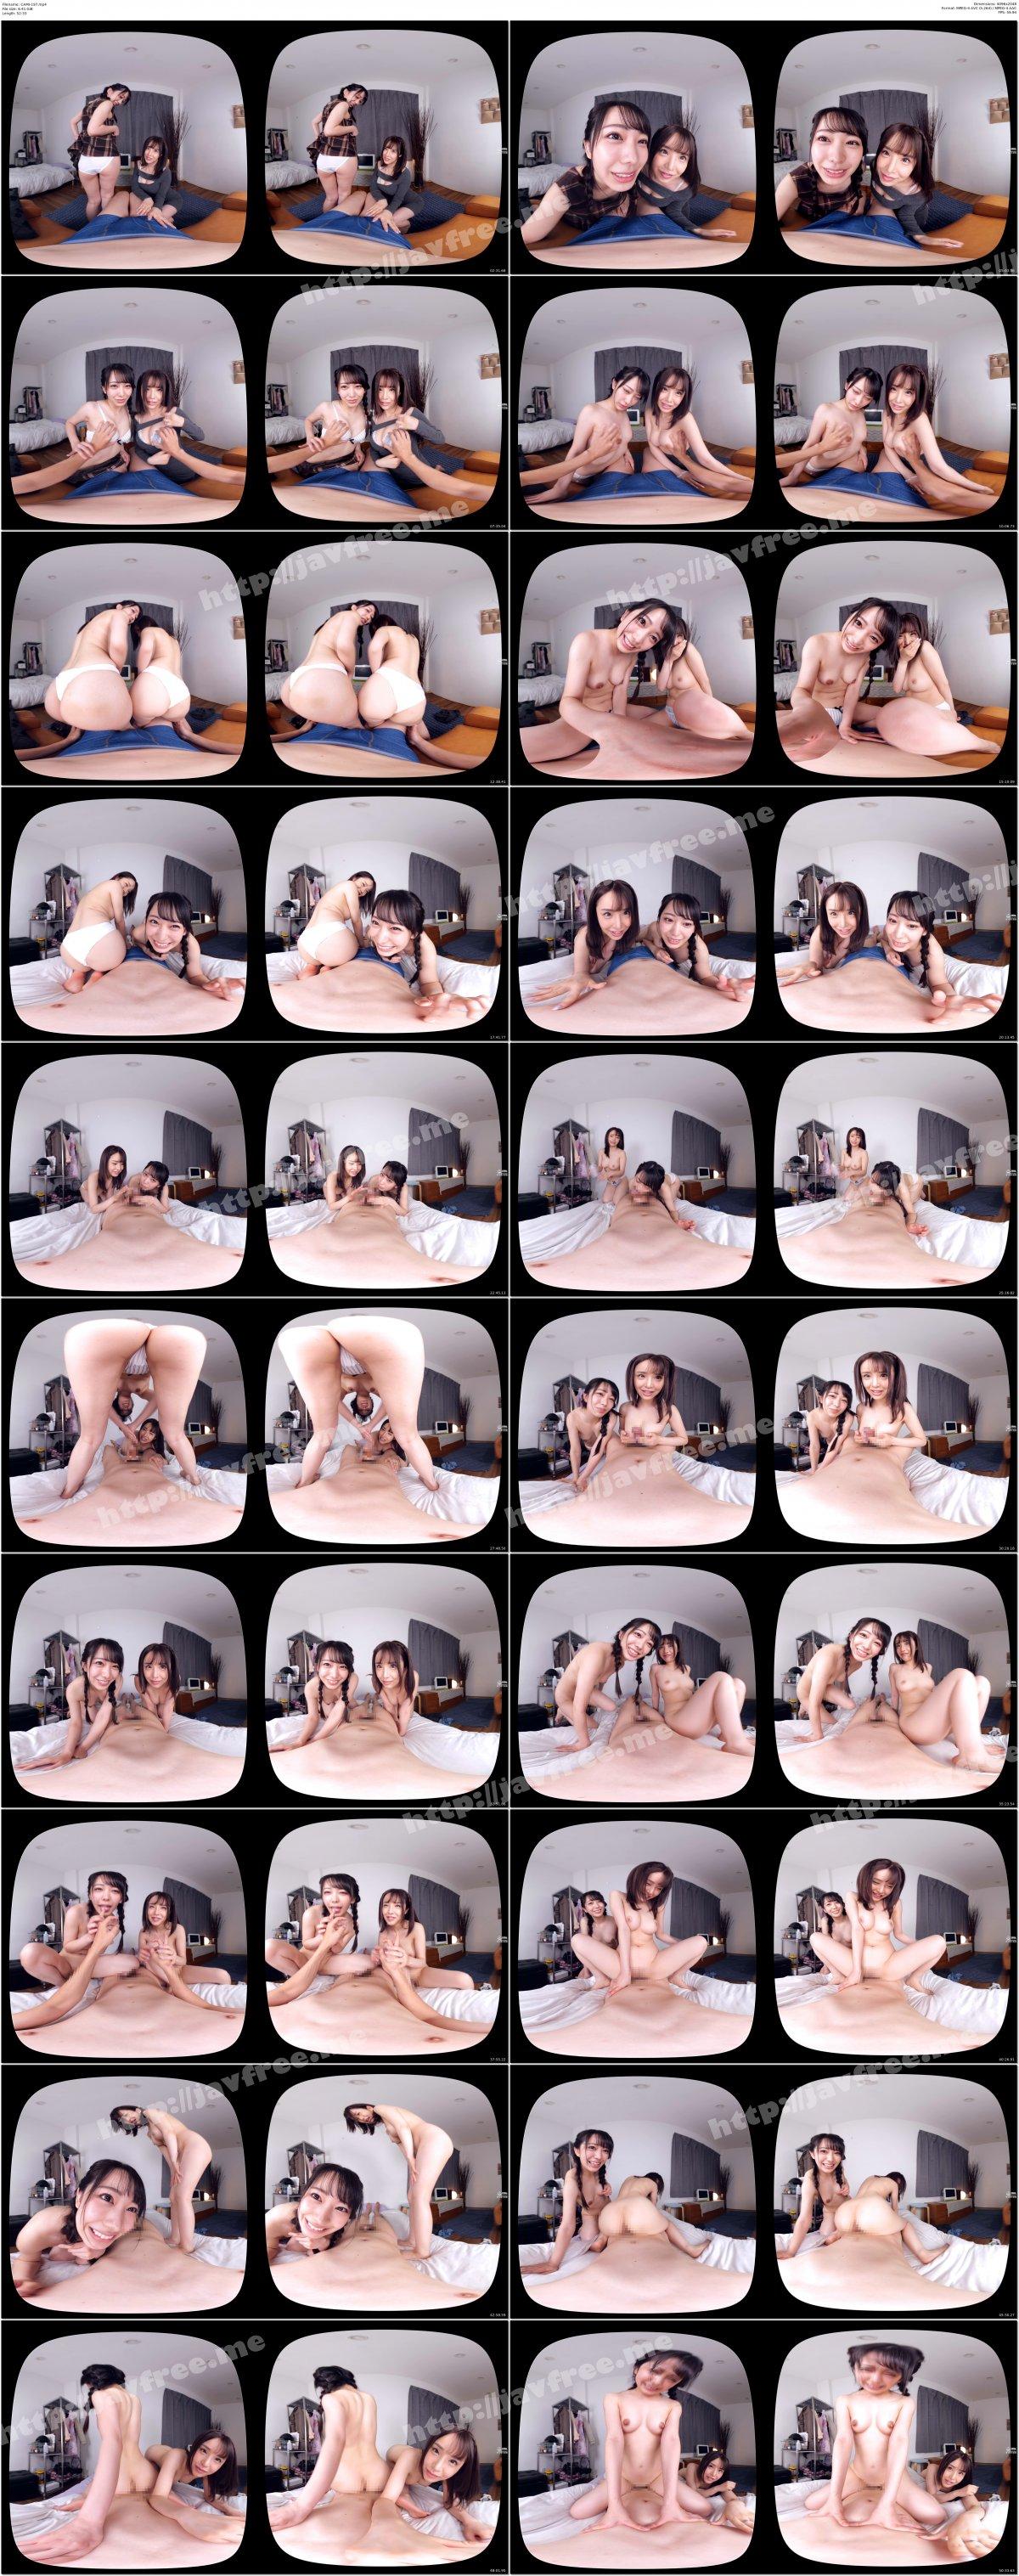 [CAMI-197] 【VR】初共演!弥生みづきと七瀬もなによる淫乱女子大生のドMオヤジ狩りハーレム3P体験 - image CAMI-197 on https://javfree.me